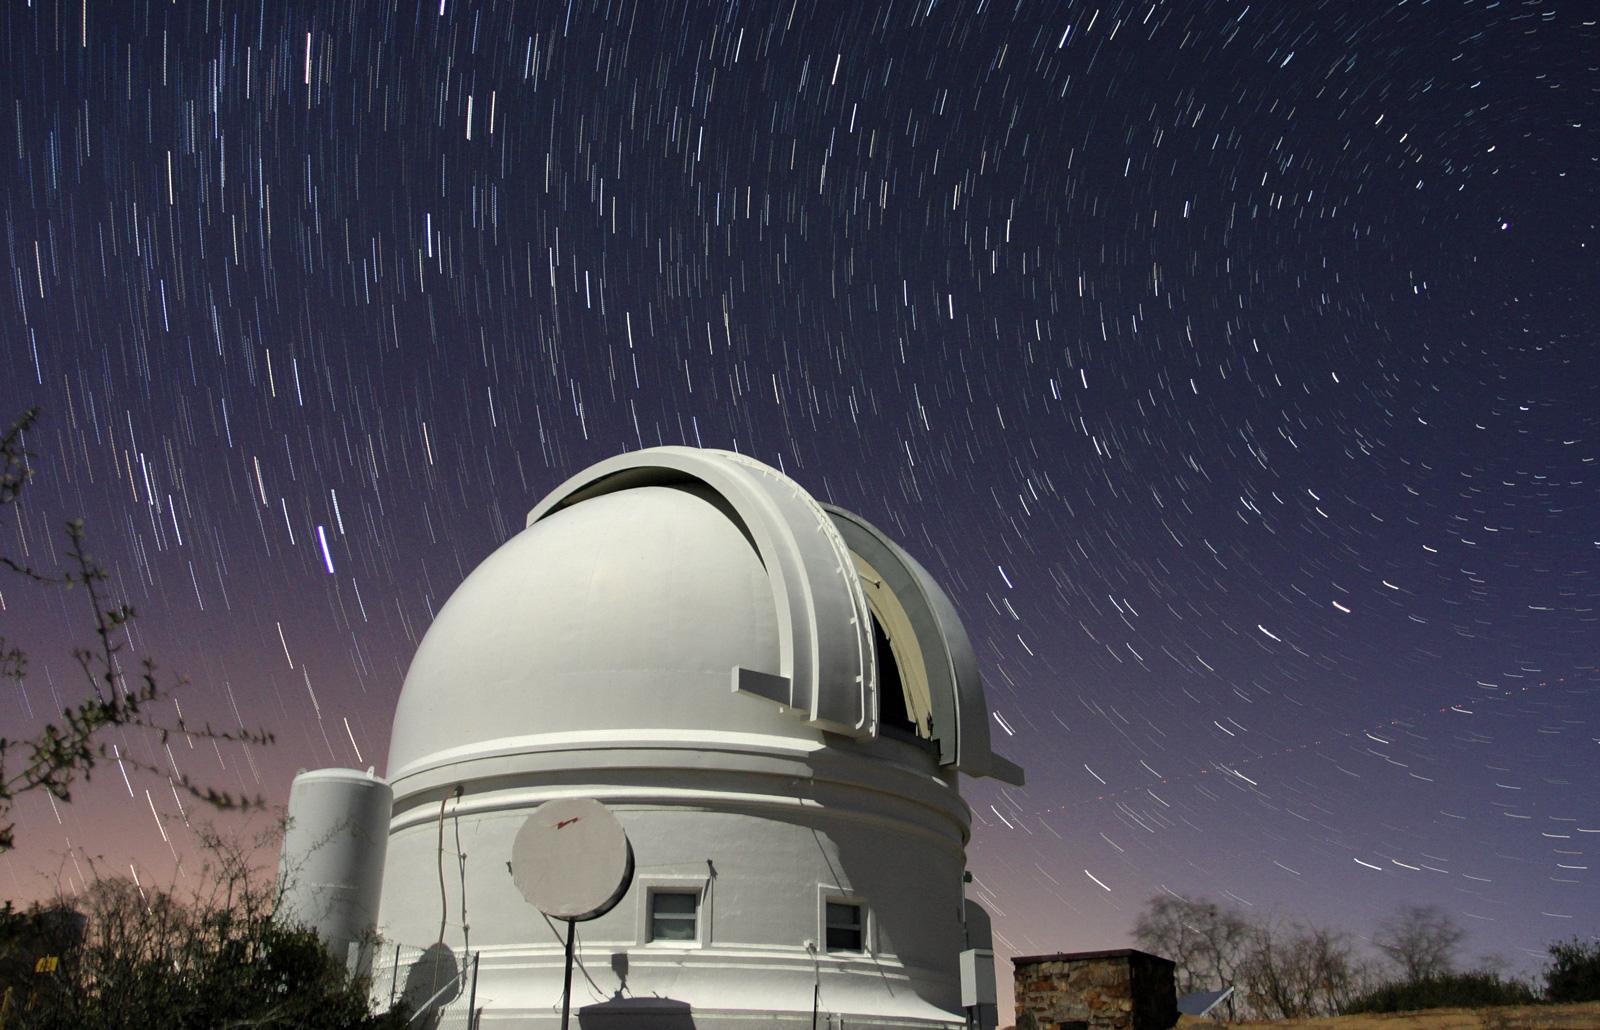 W-SHTAO Telescope Sky Telescope Pure Copper Binoculars Low,